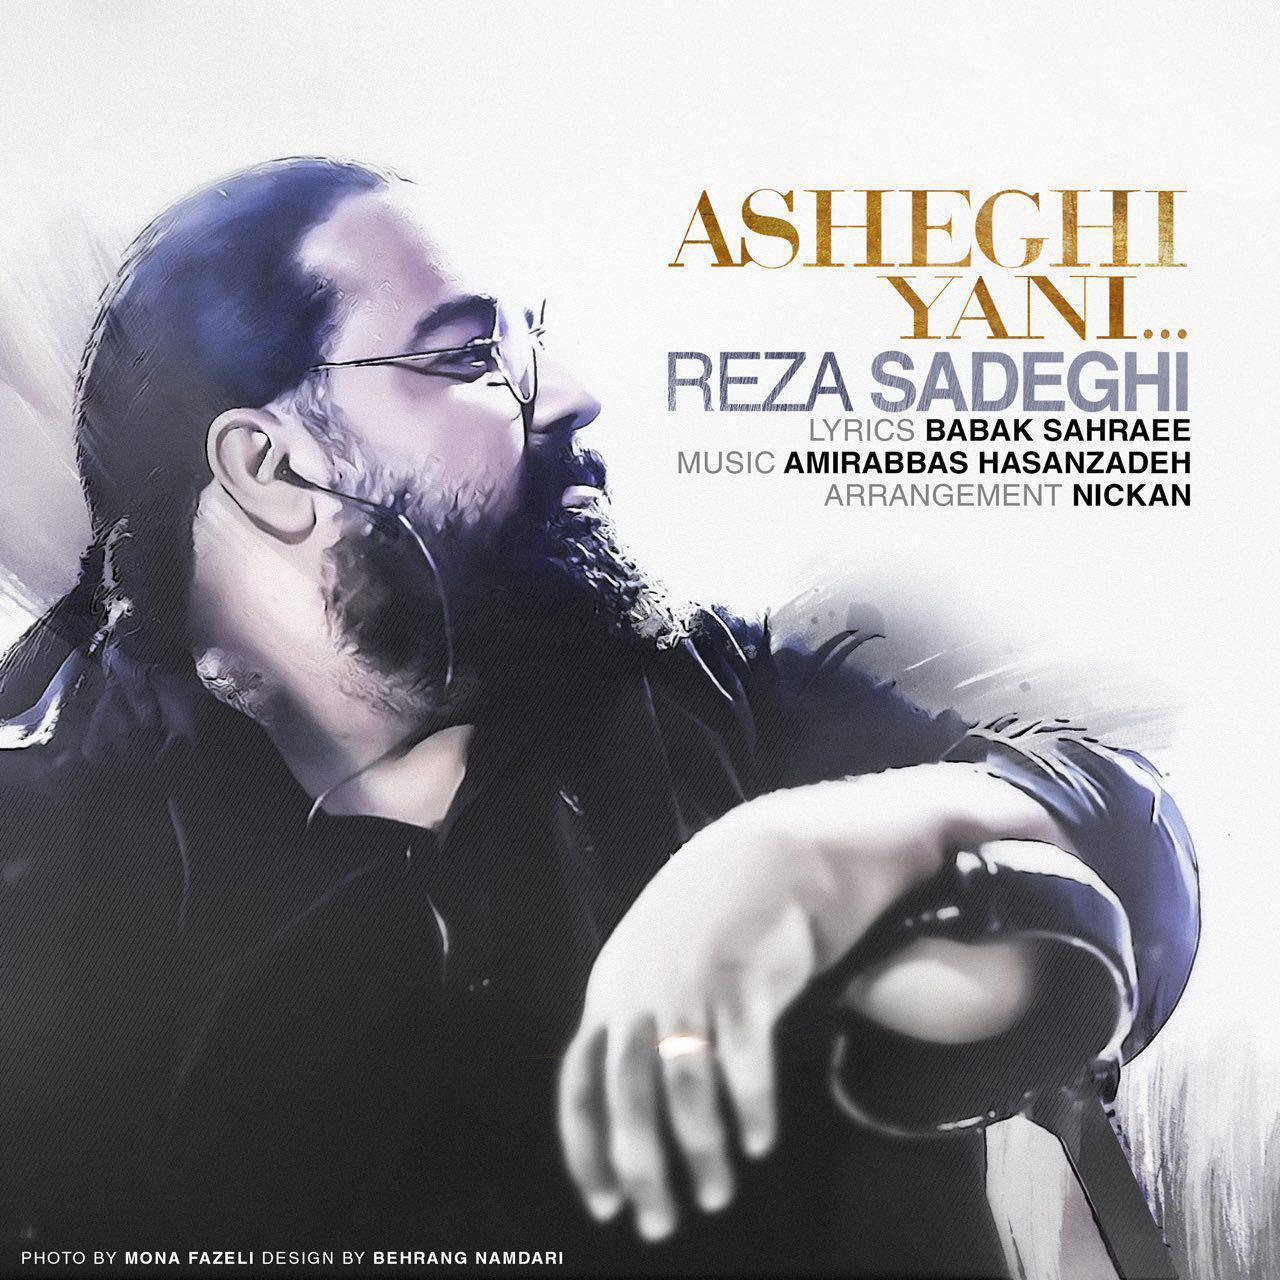 Reza Sadeghi - Asheghi Yani